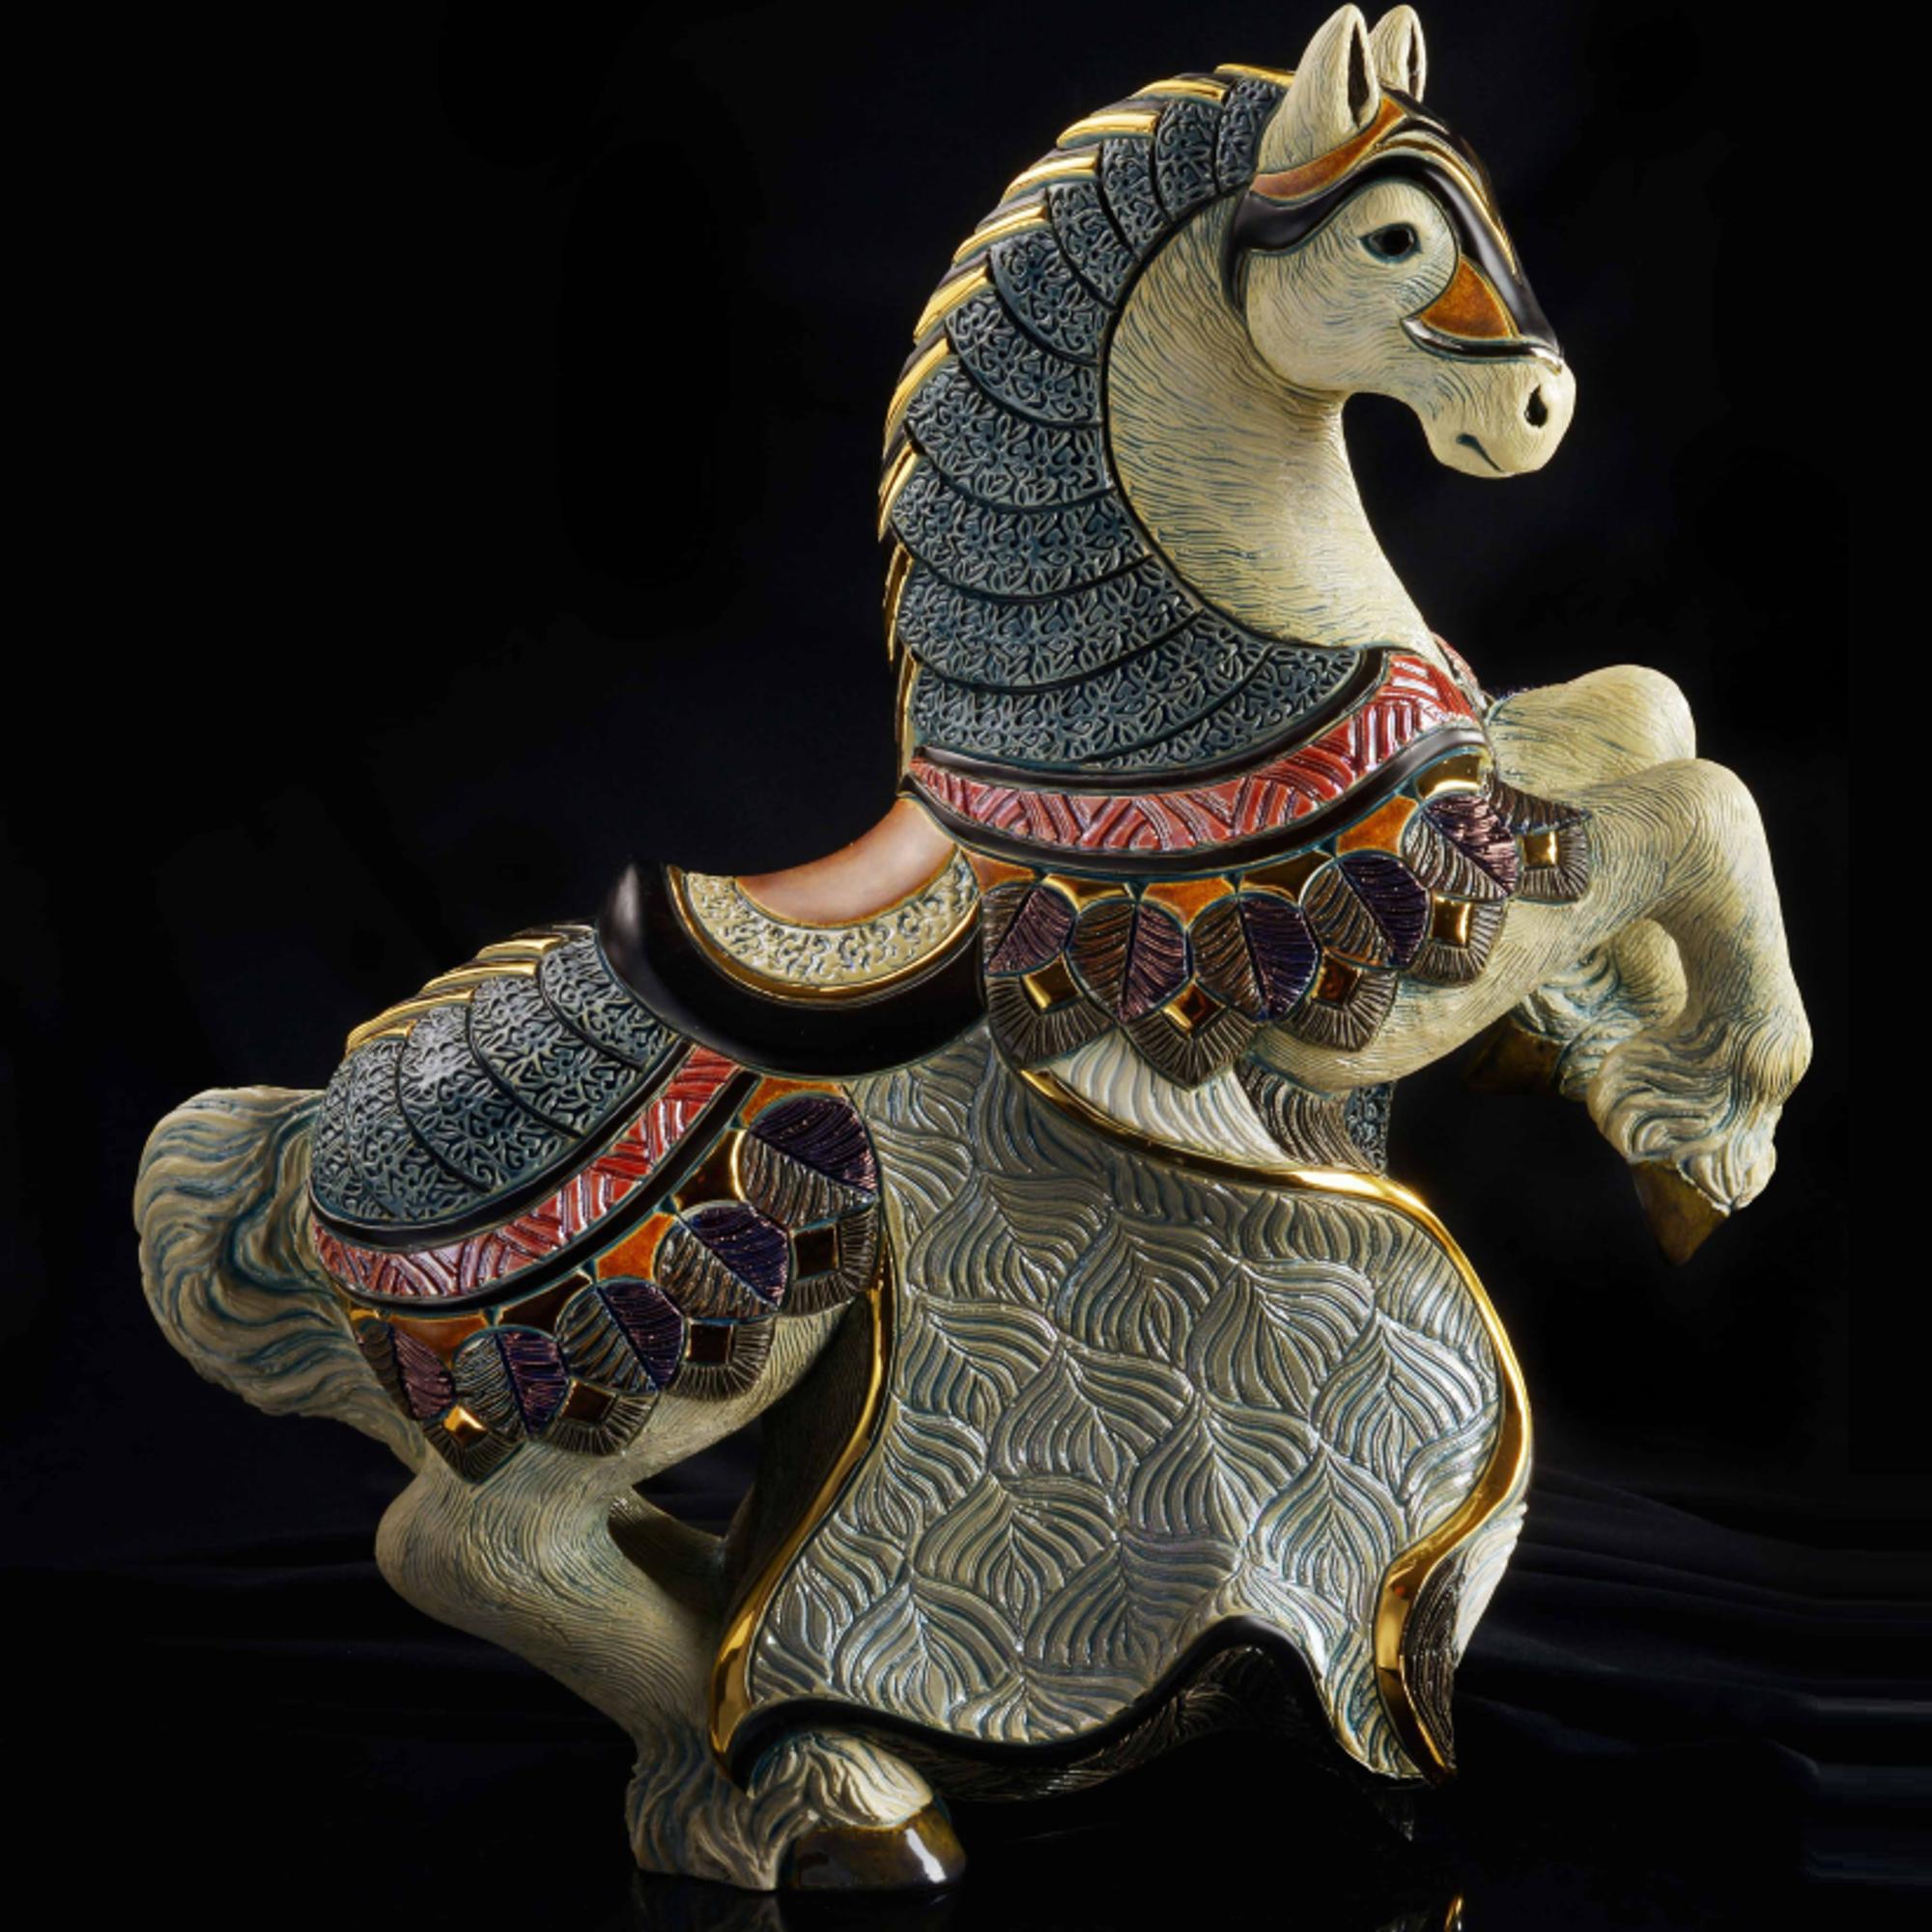 Ceramic Horse Figurine De Rosa Collection Rampant